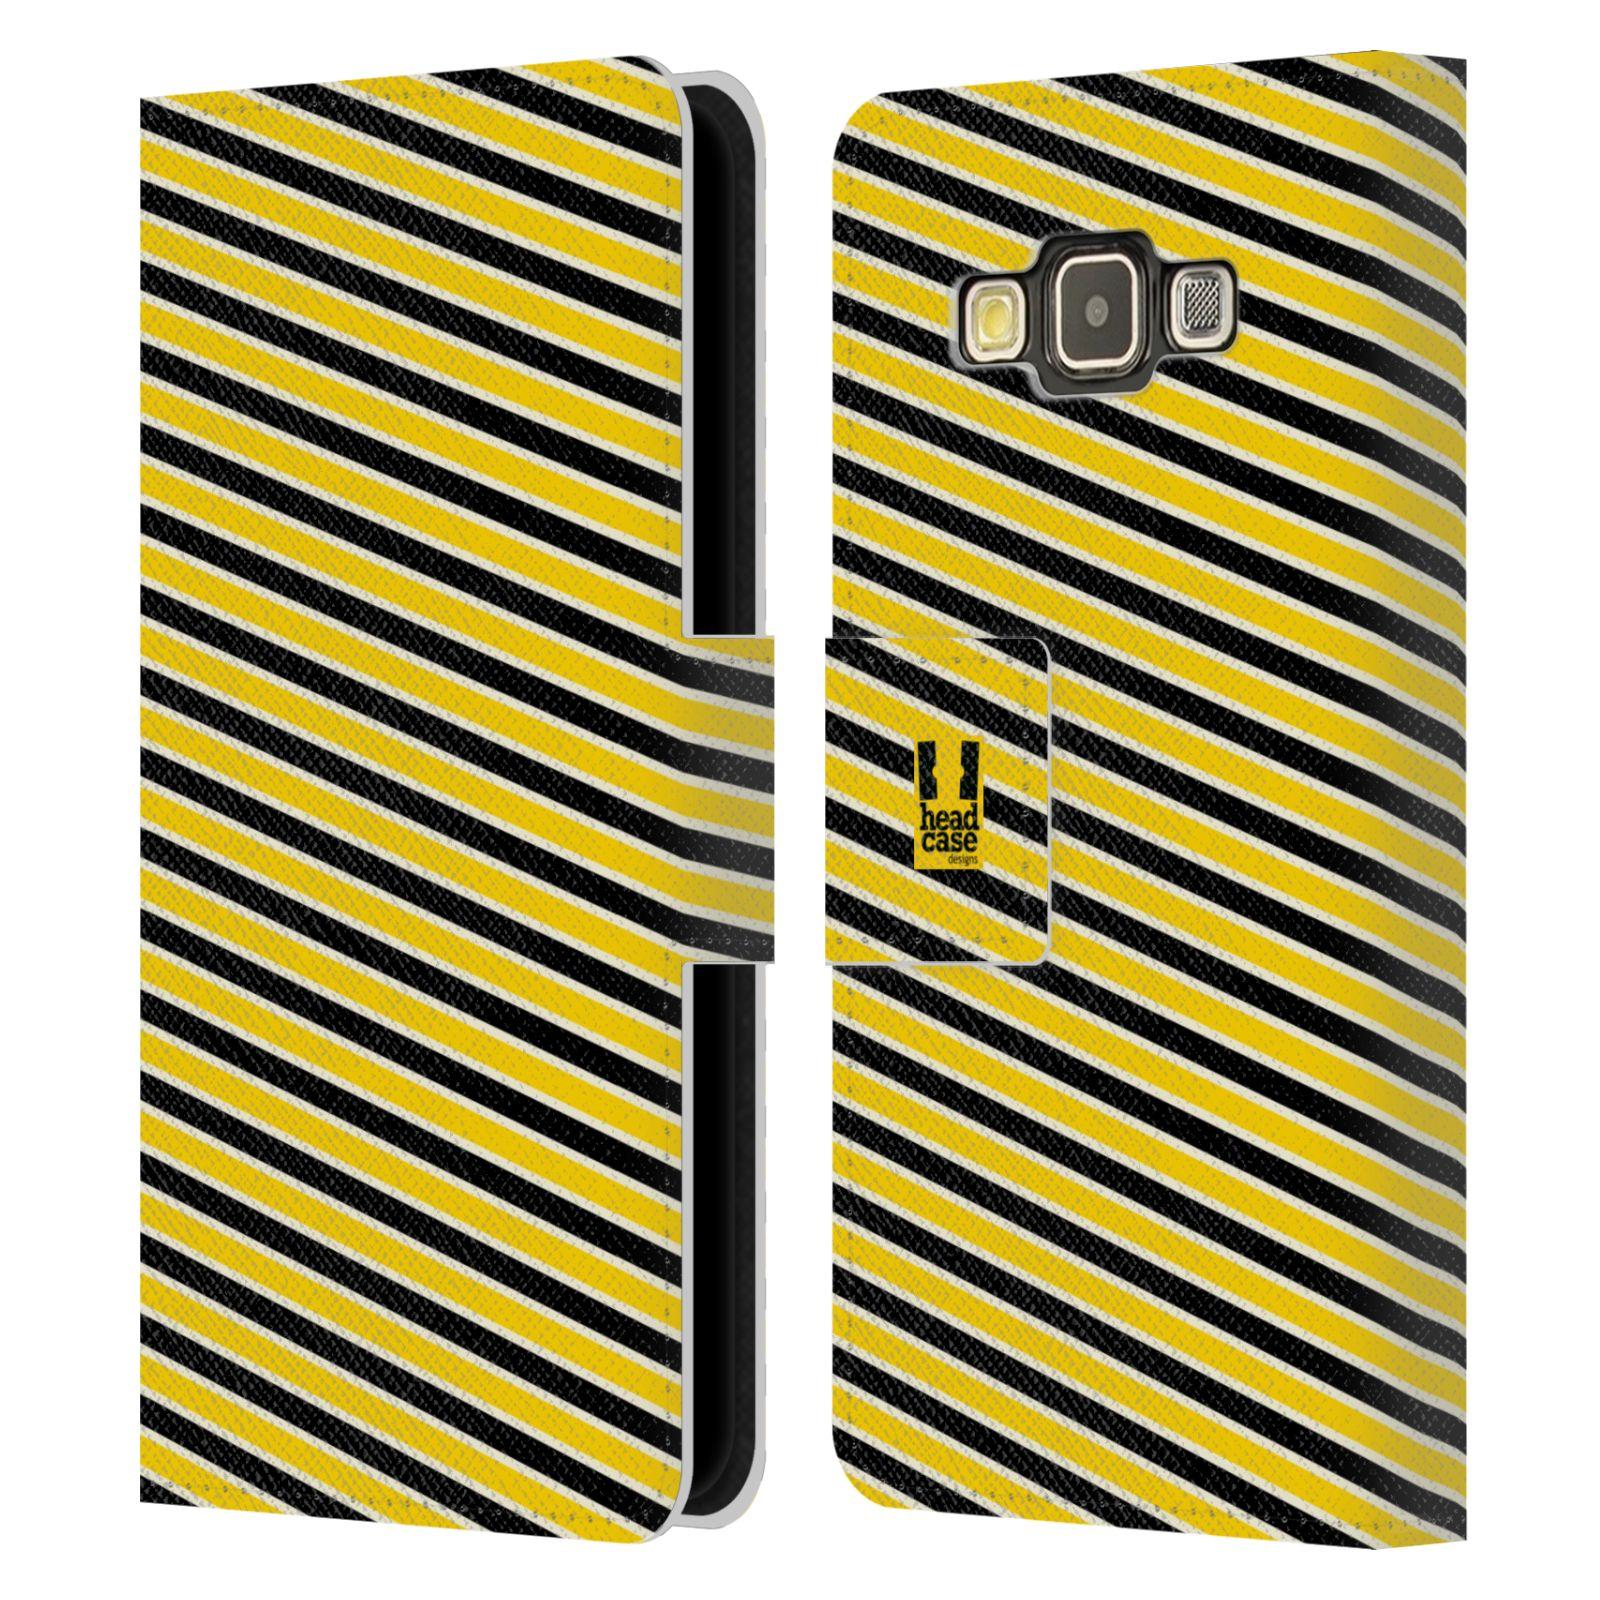 HEAD CASE Flipové pouzdro pro mobil Samsung Galaxy A3 VČELÍ VZOR pruhy žlutá a černá